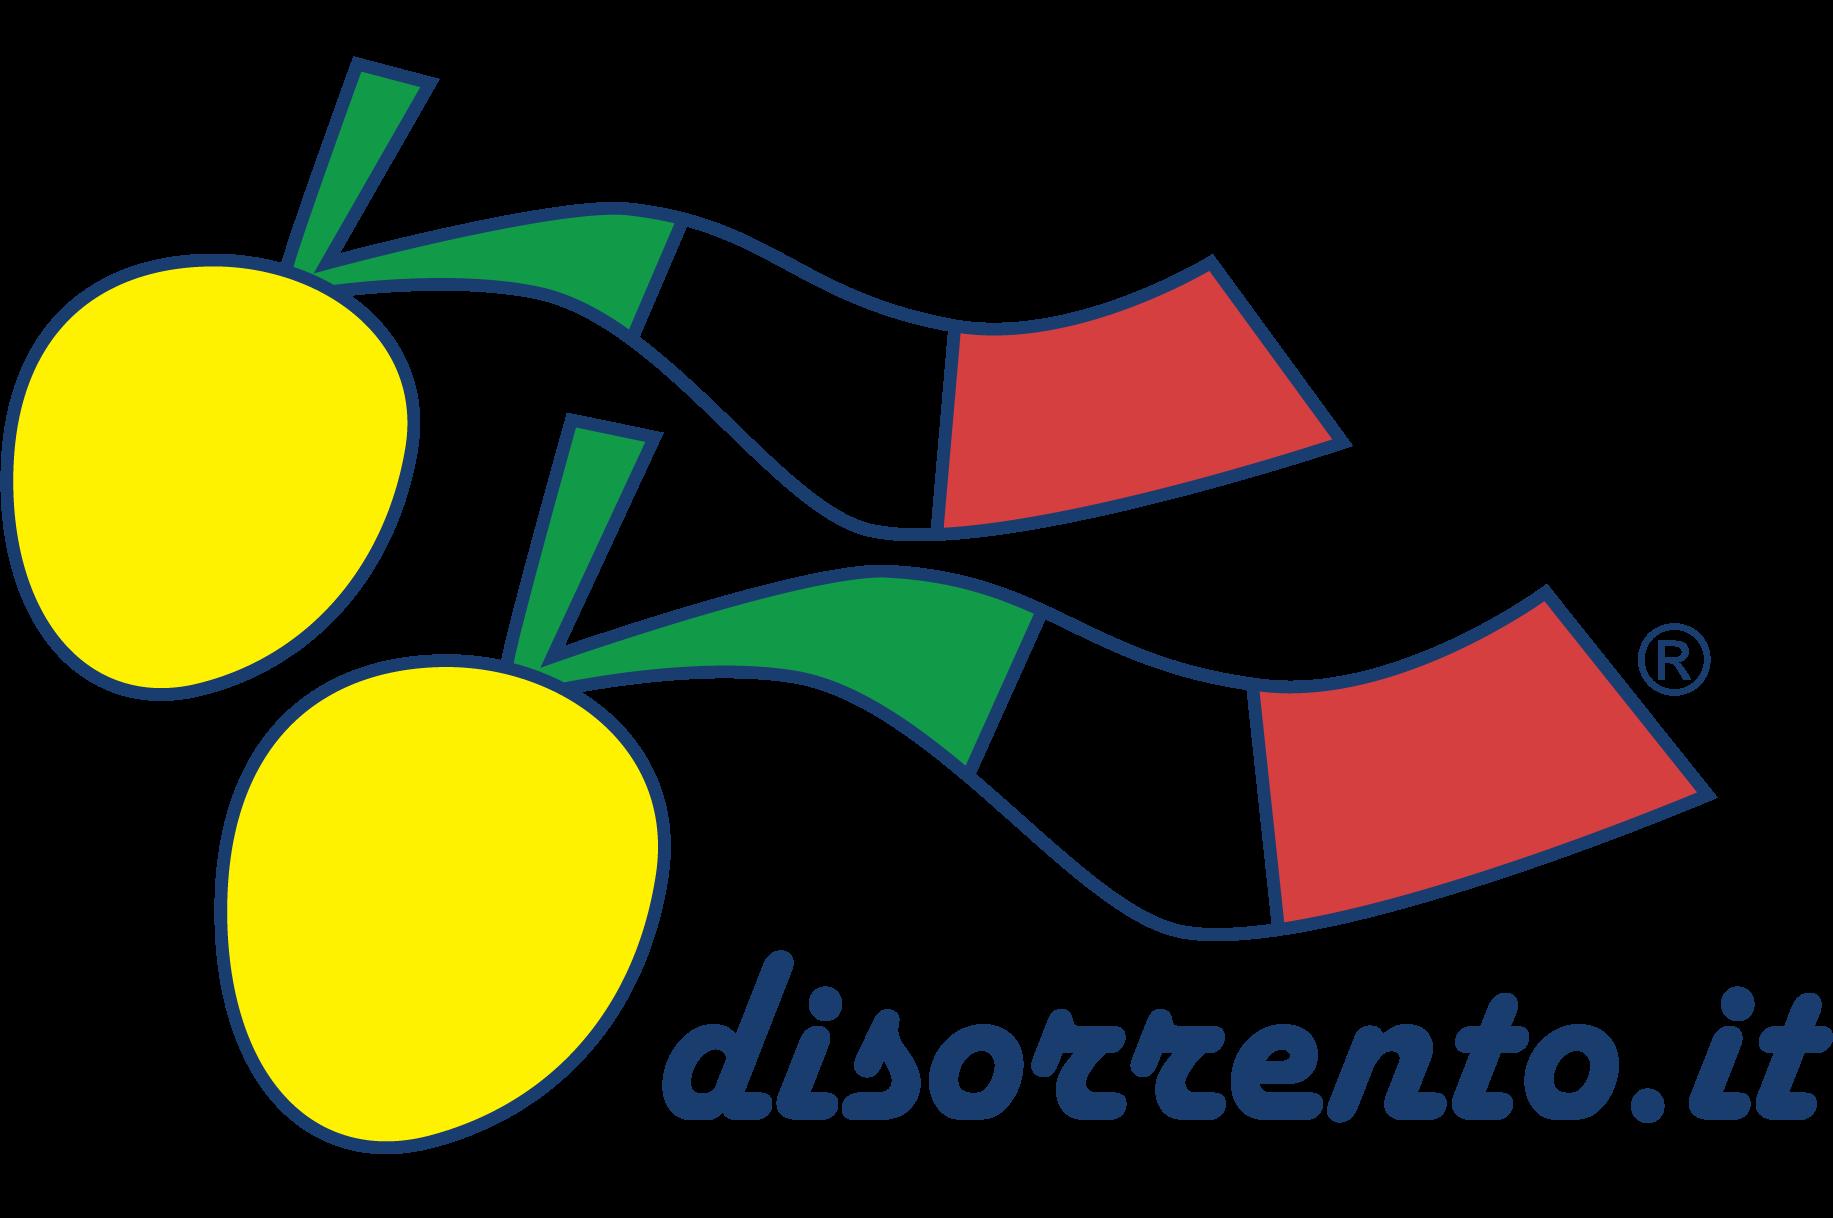 disorrento.it